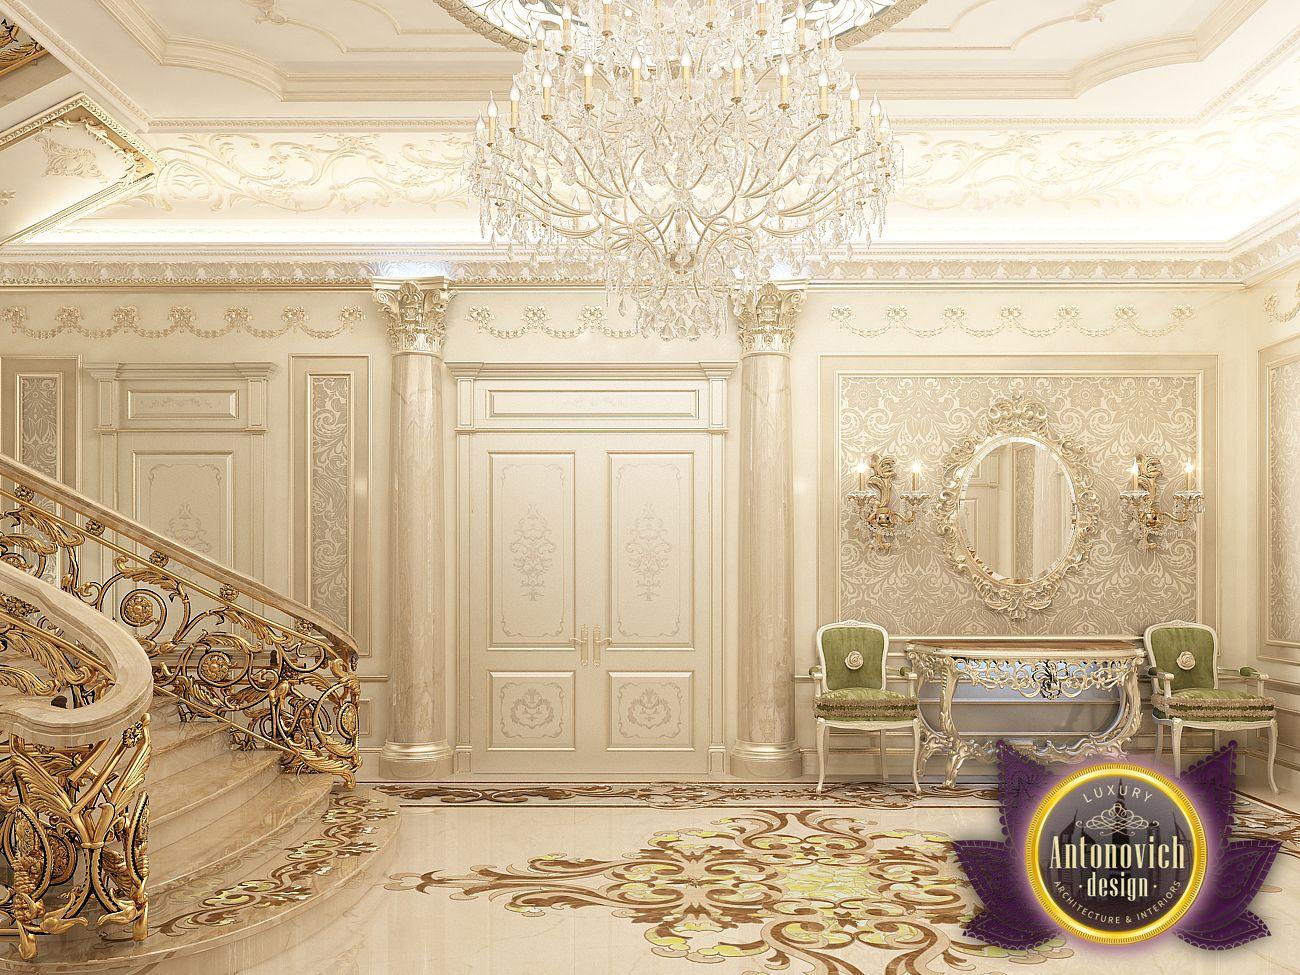 Luxury antonovich design uae dream interior of luxury for Home wallpaper kuwait